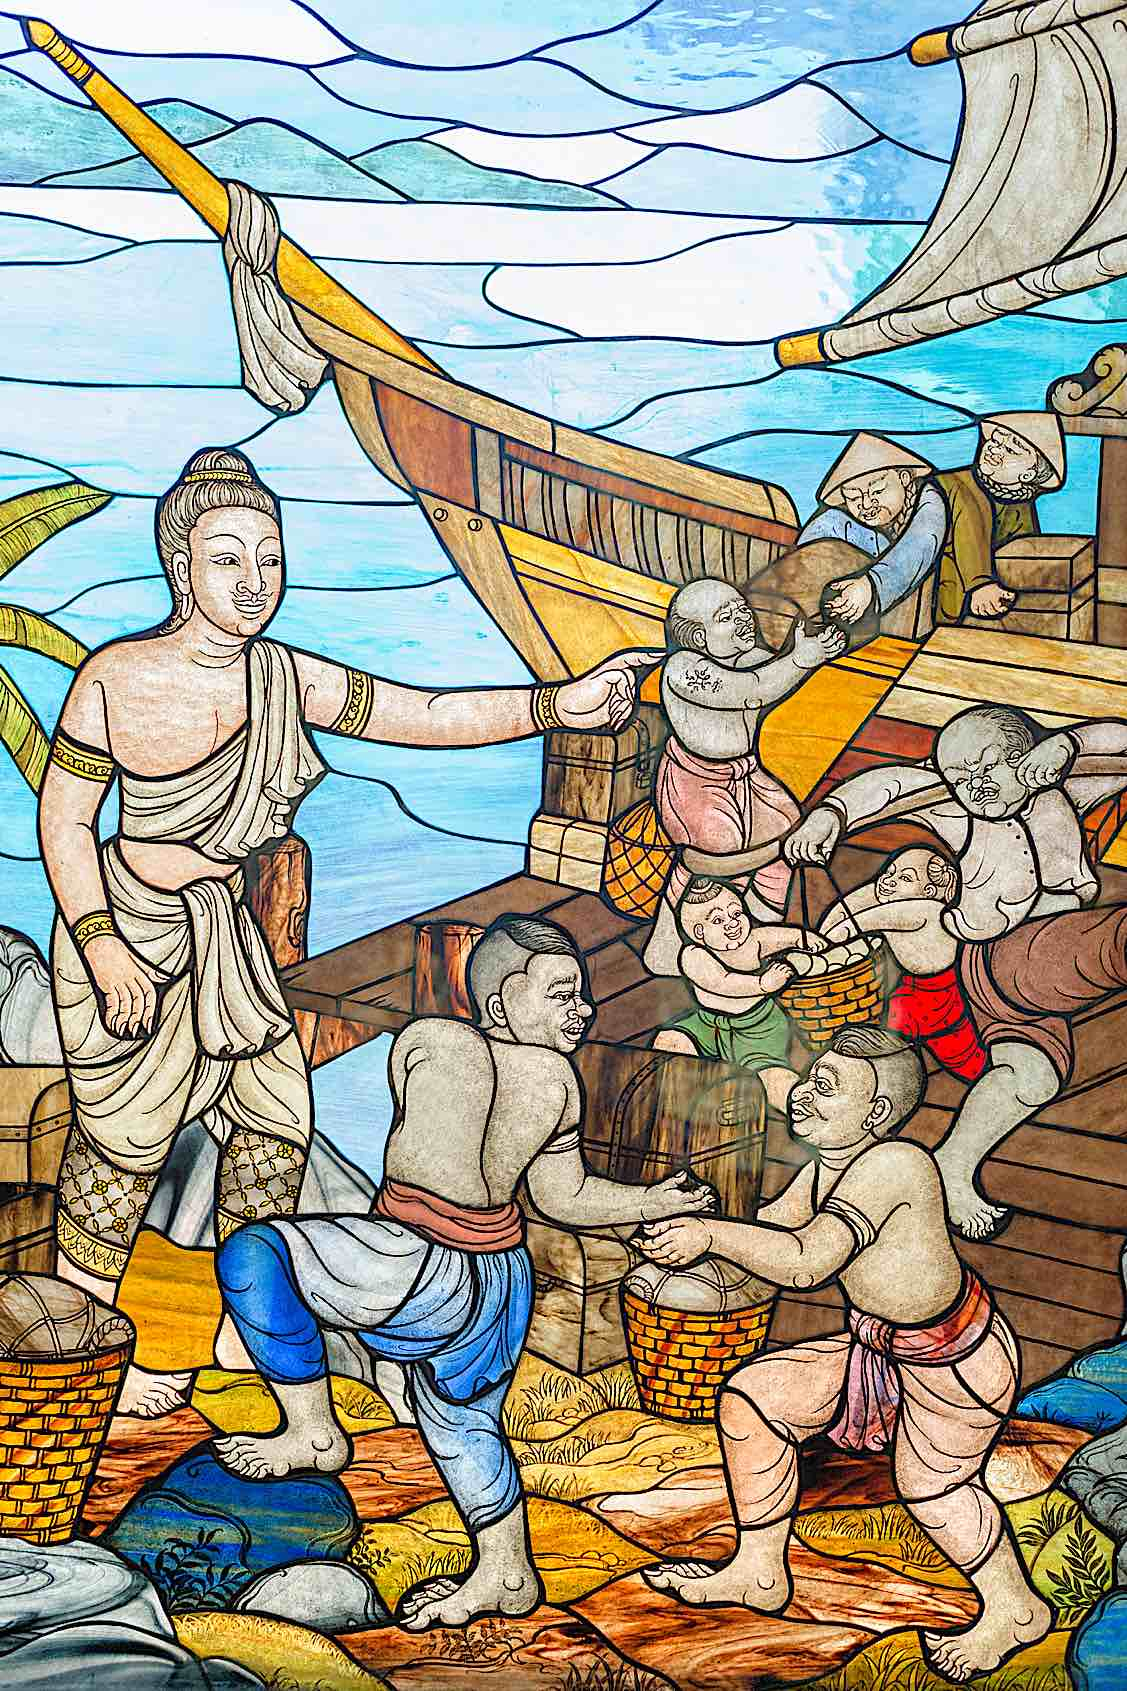 Buddha Weekly Jataka Tales story of Mahajanaka Buddhism